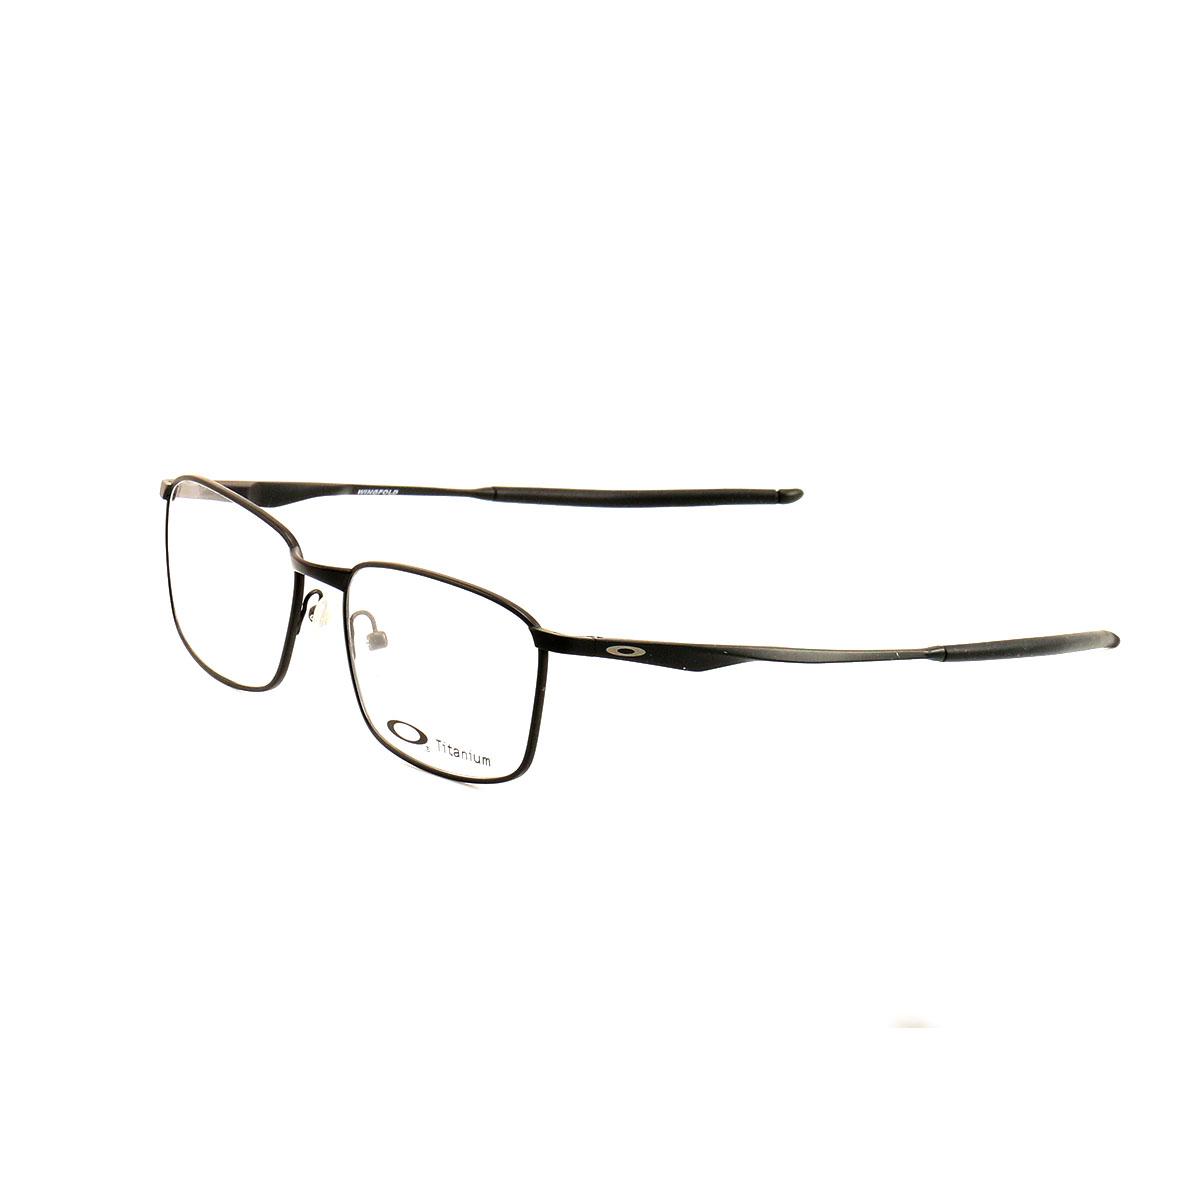 8e0c7260ada Oakley Wingfold Eyeglasses OX5100 01 Satin Black 52 16 139 Titanium Demo  lens